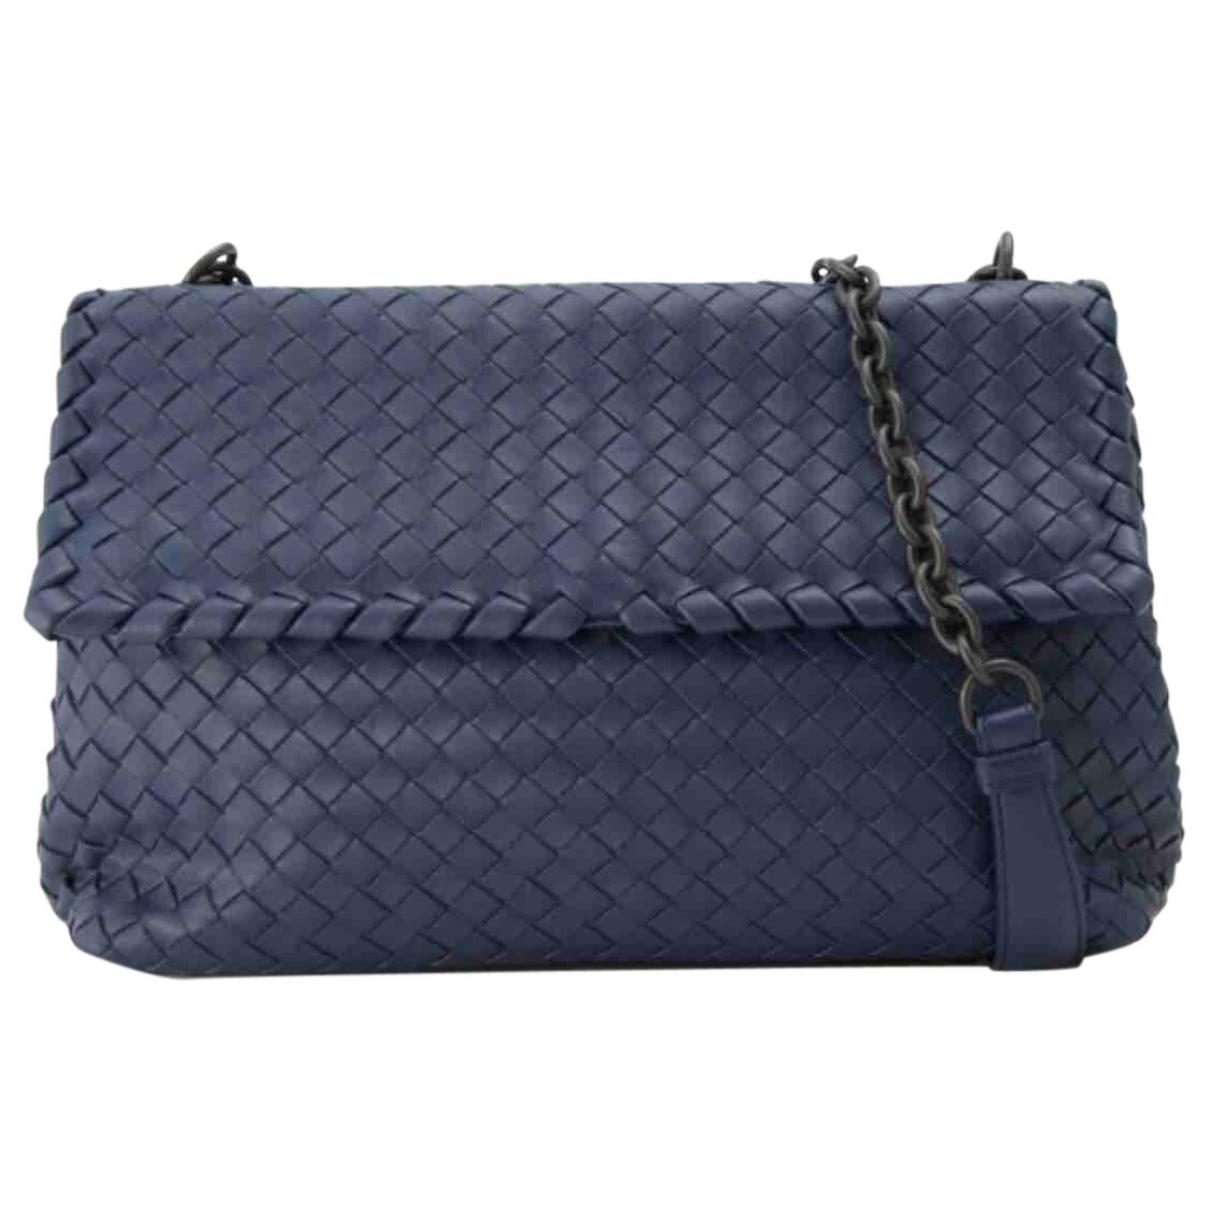 Bottega Veneta Olimpia Blue Leather handbag for Women \N